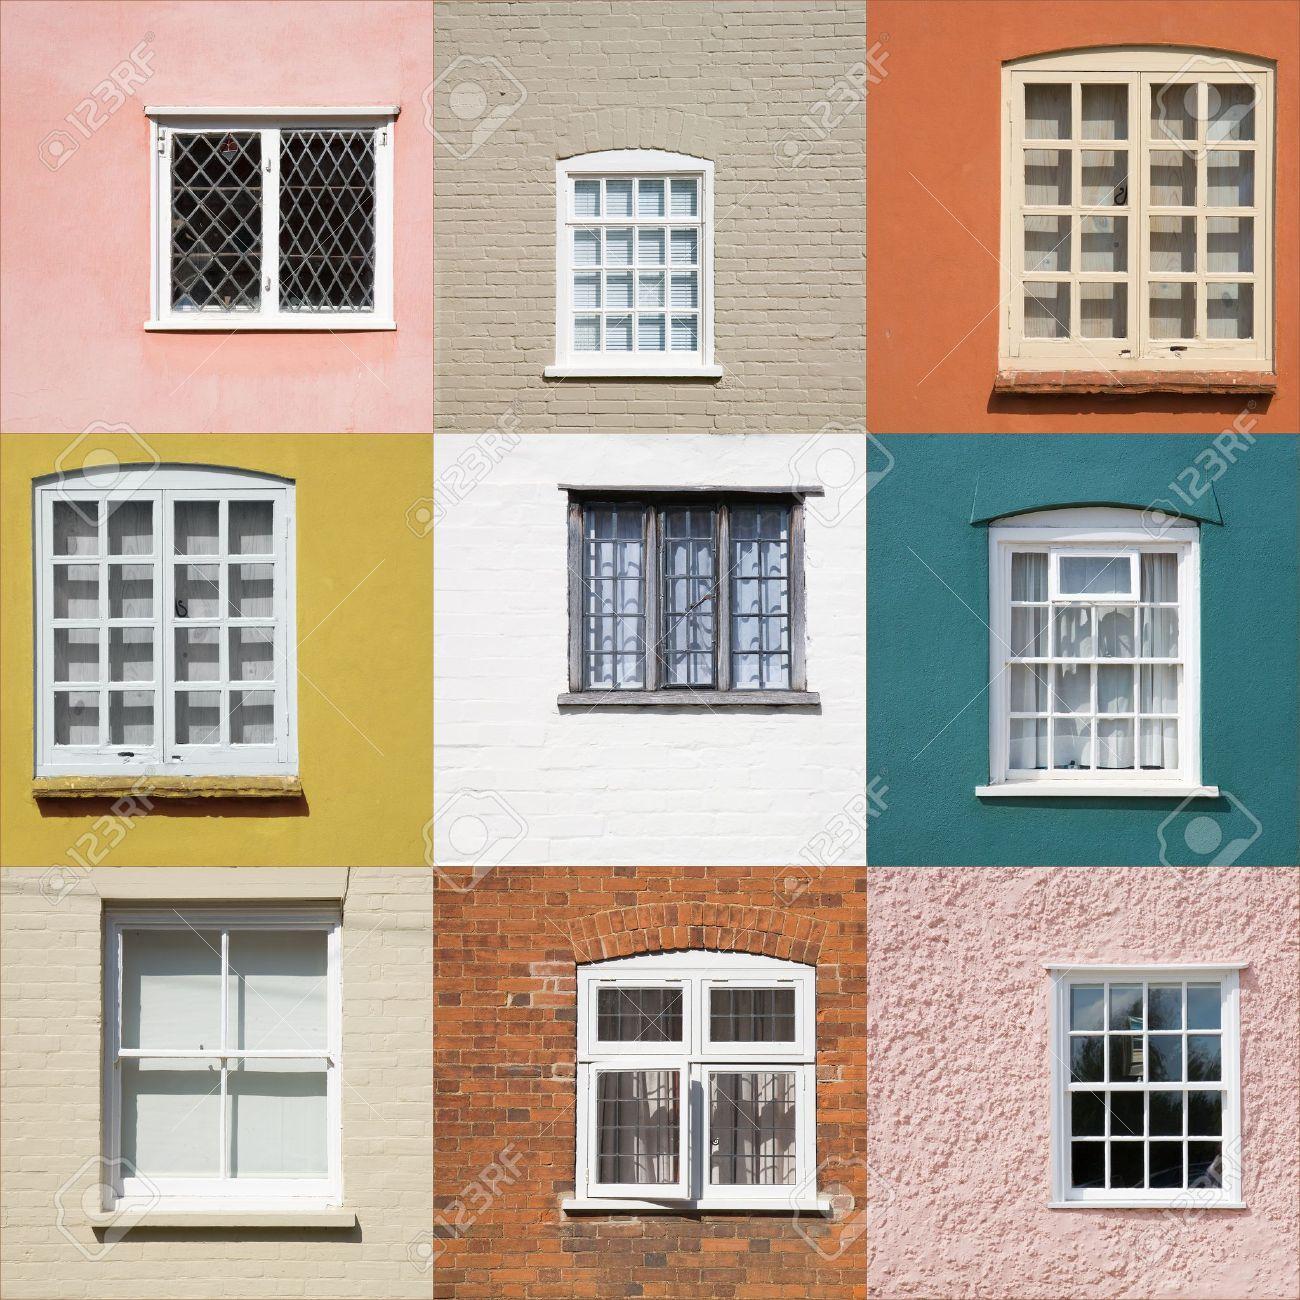 11209326-collection-of-old-windows-Stock-Photo-window-pane-frame.jpg (1300×1300)